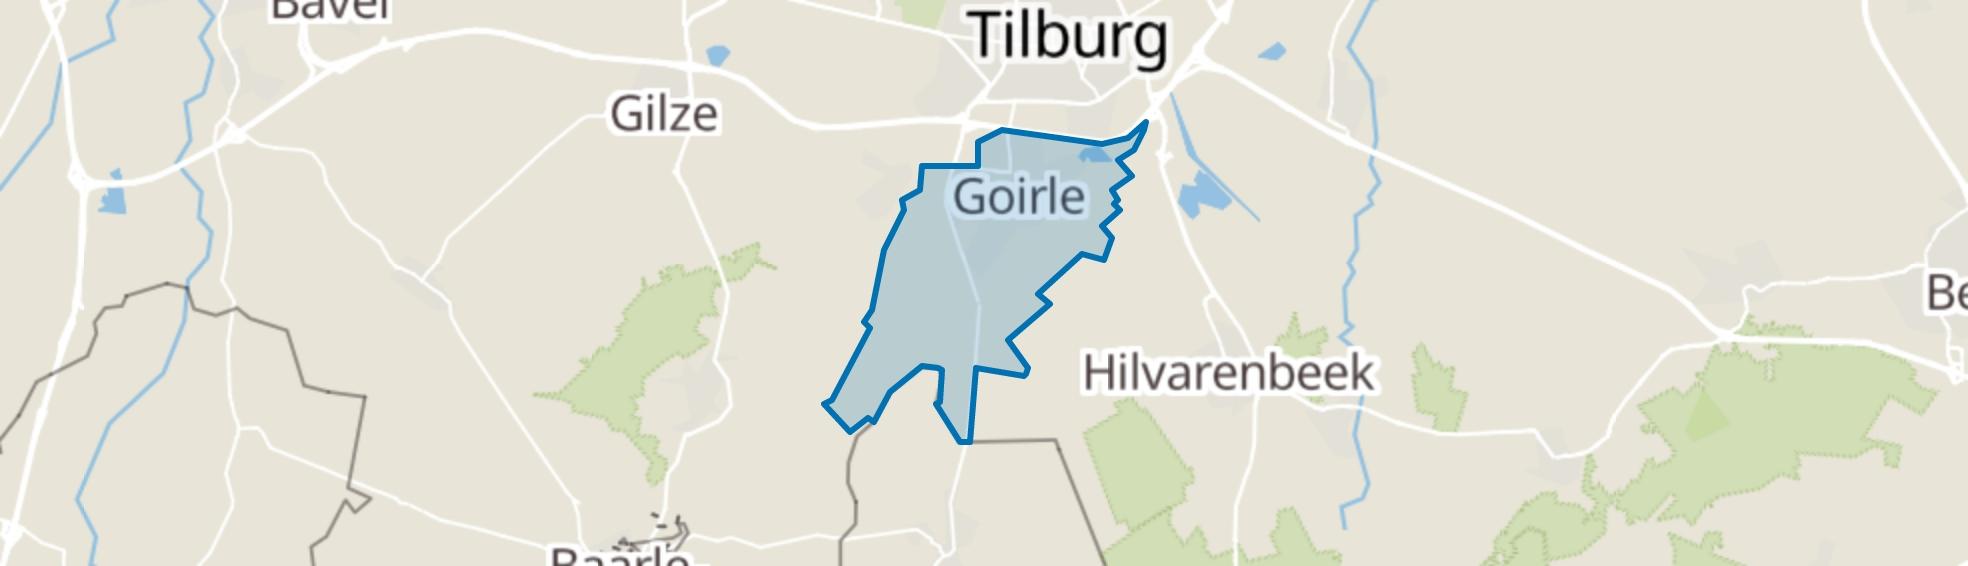 Goirle map